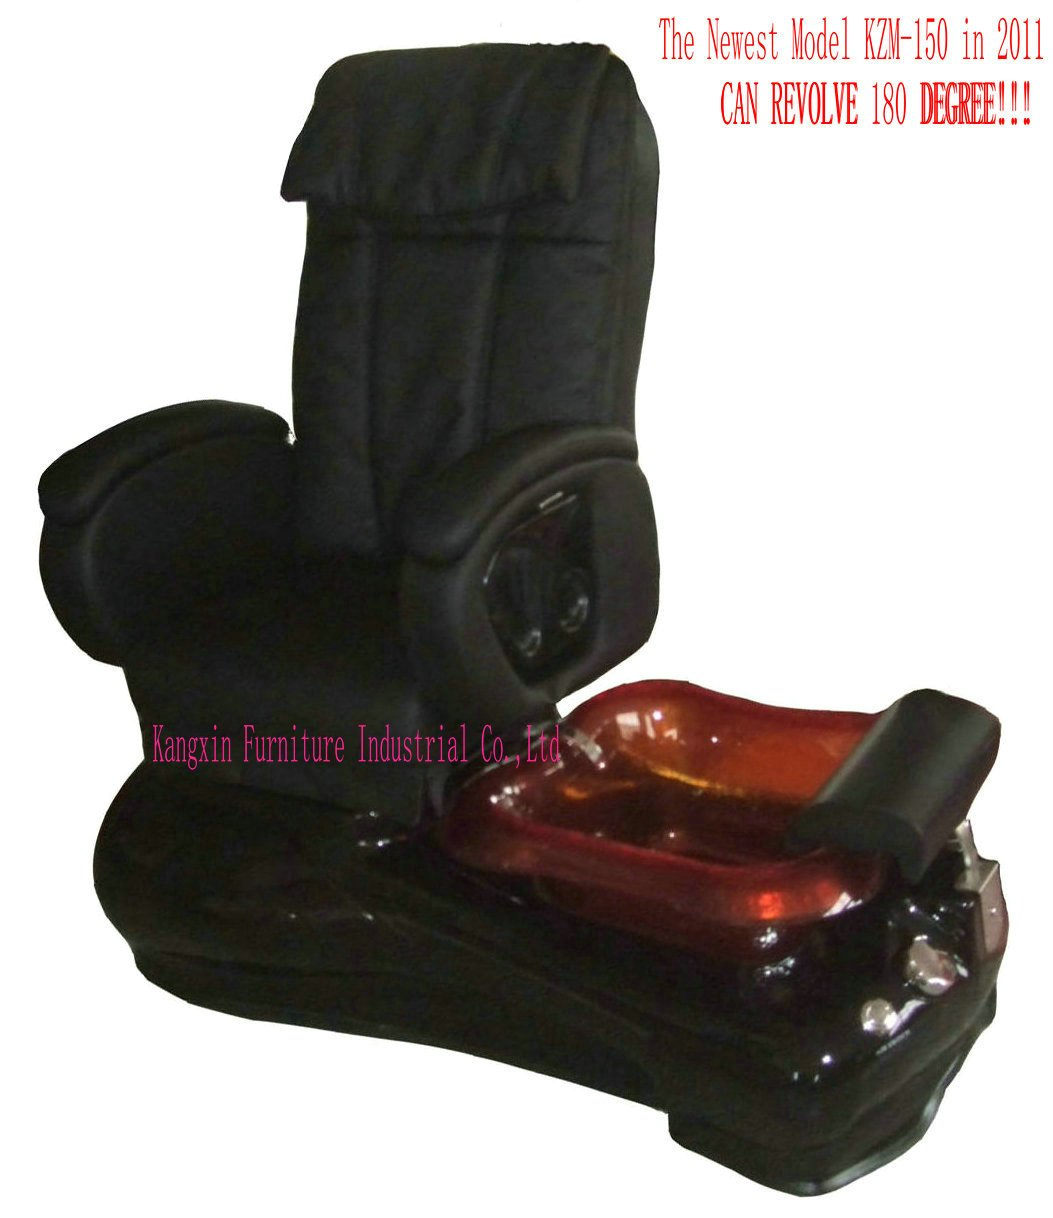 Popular foot model requirements buy popular foot model for 180 degree salon